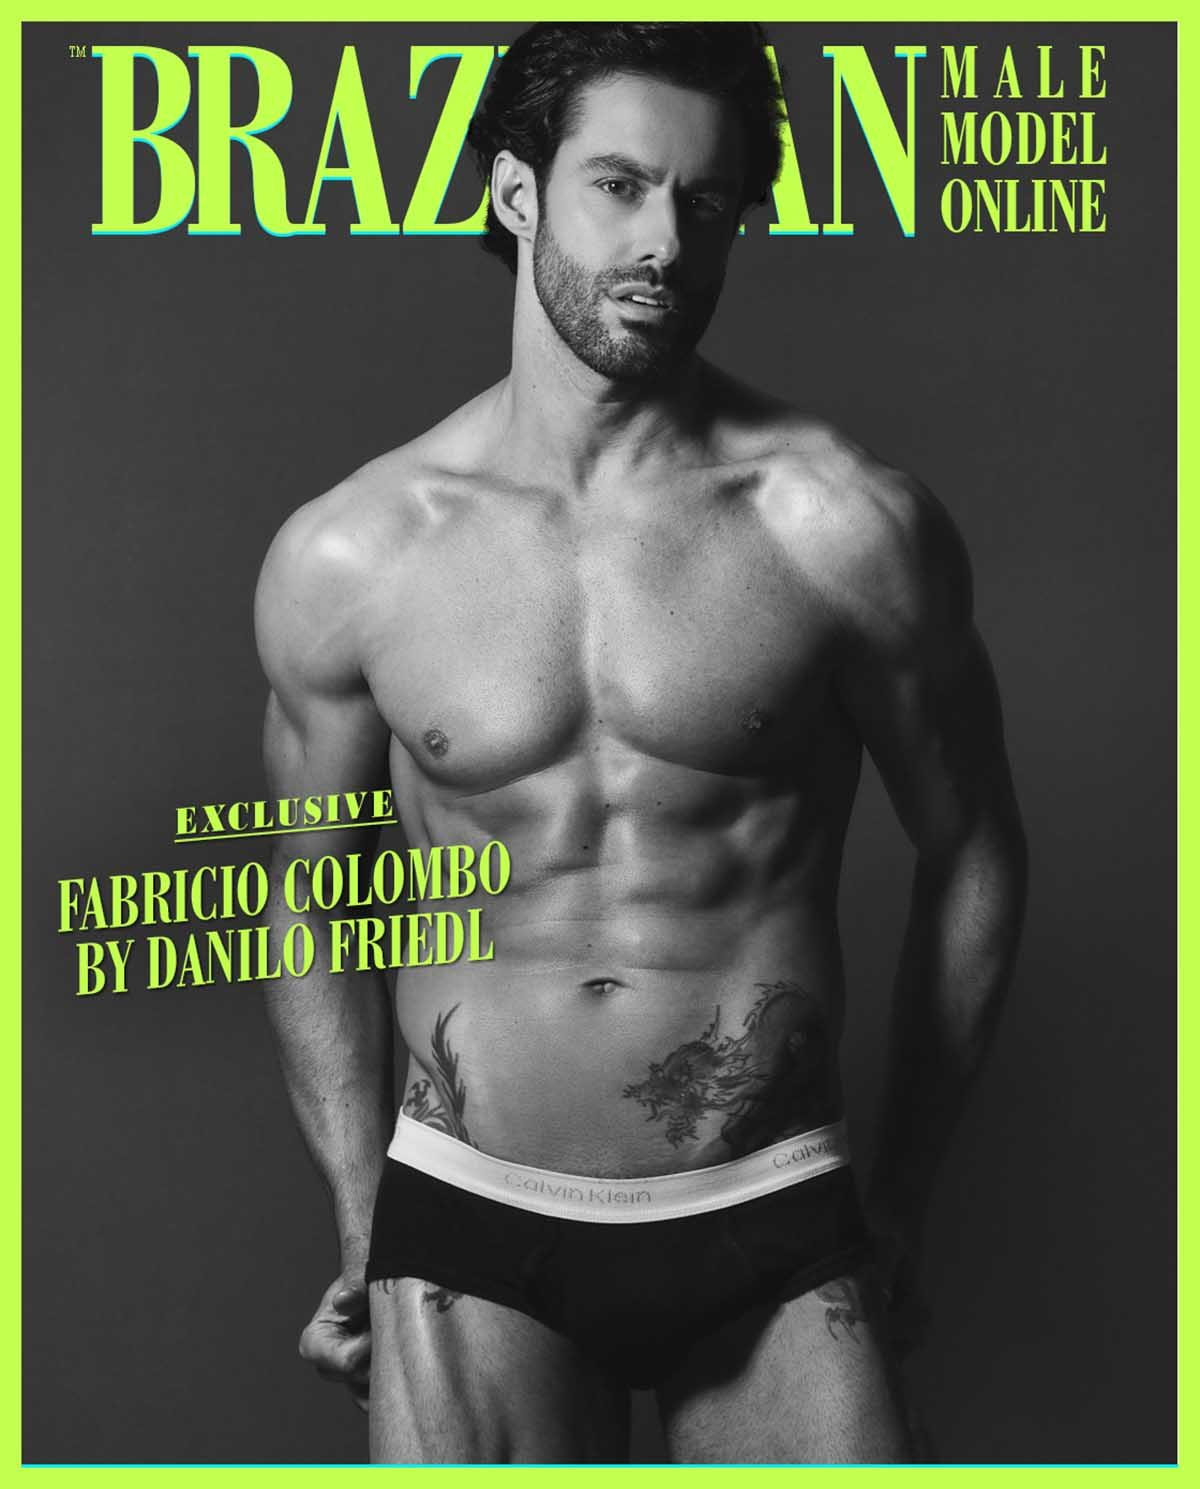 Fabricio Colombo by Danilo Friedl